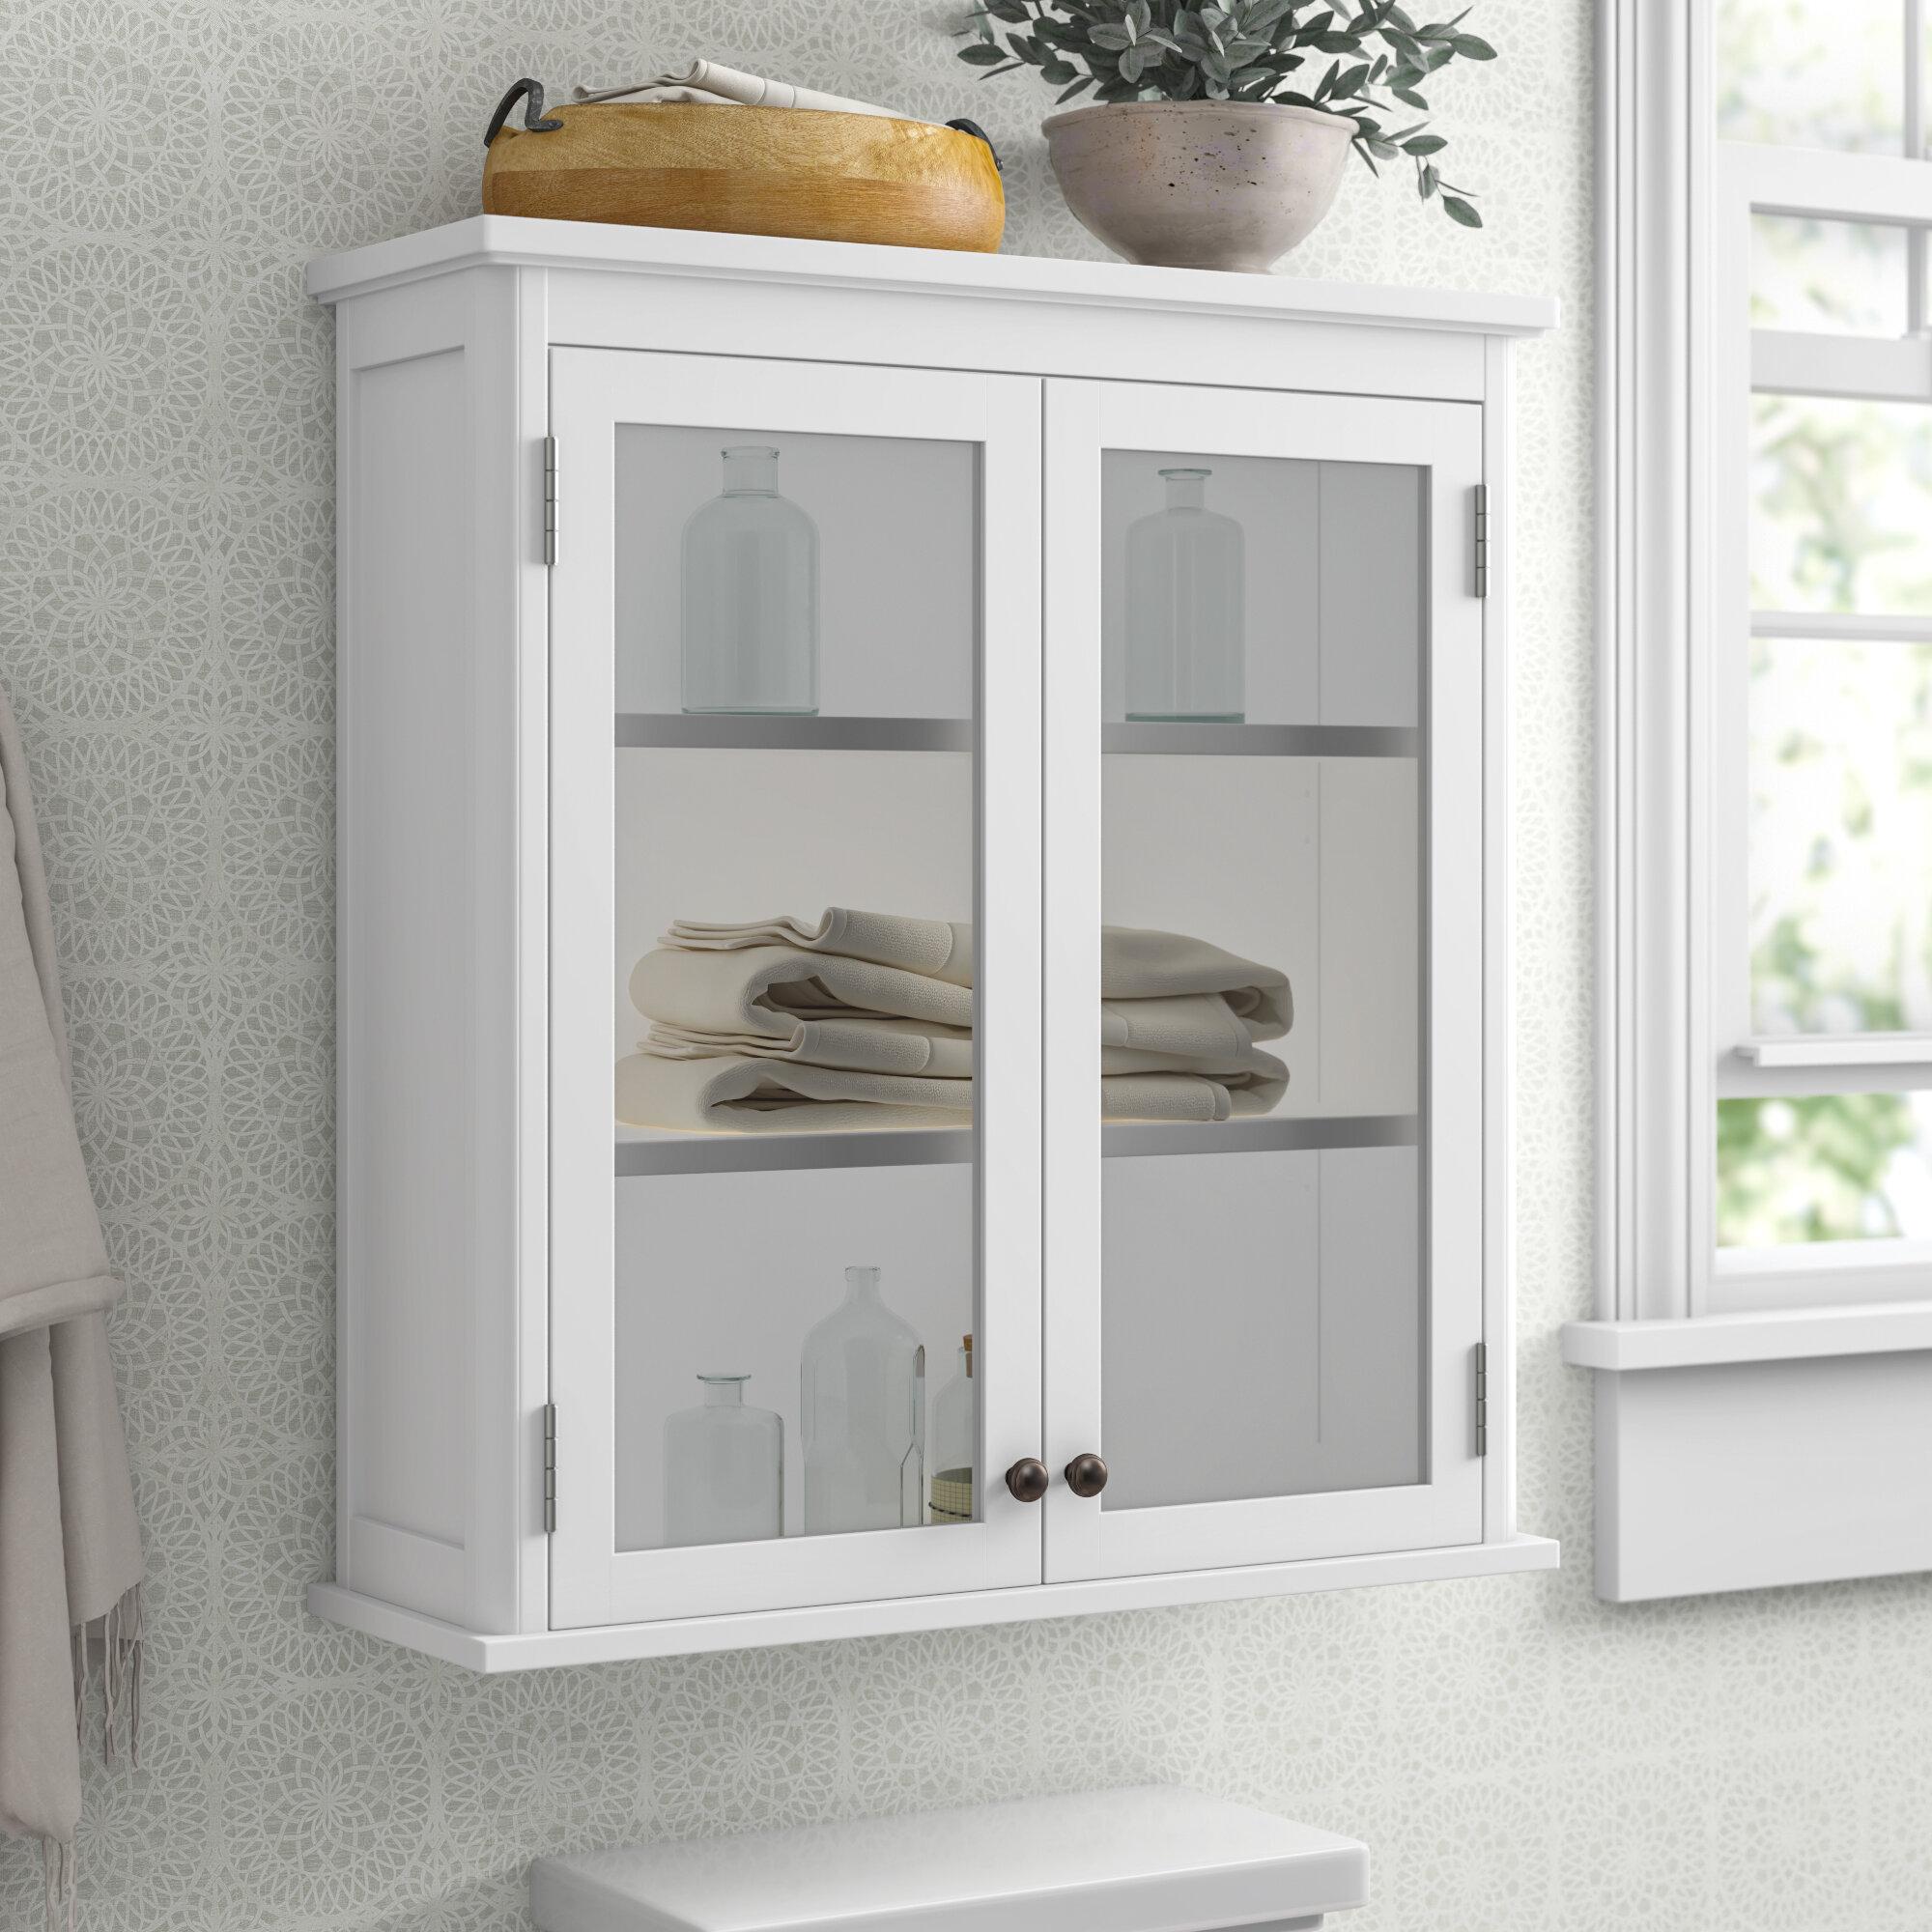 Wall Mounted Bath Storage Cabinet